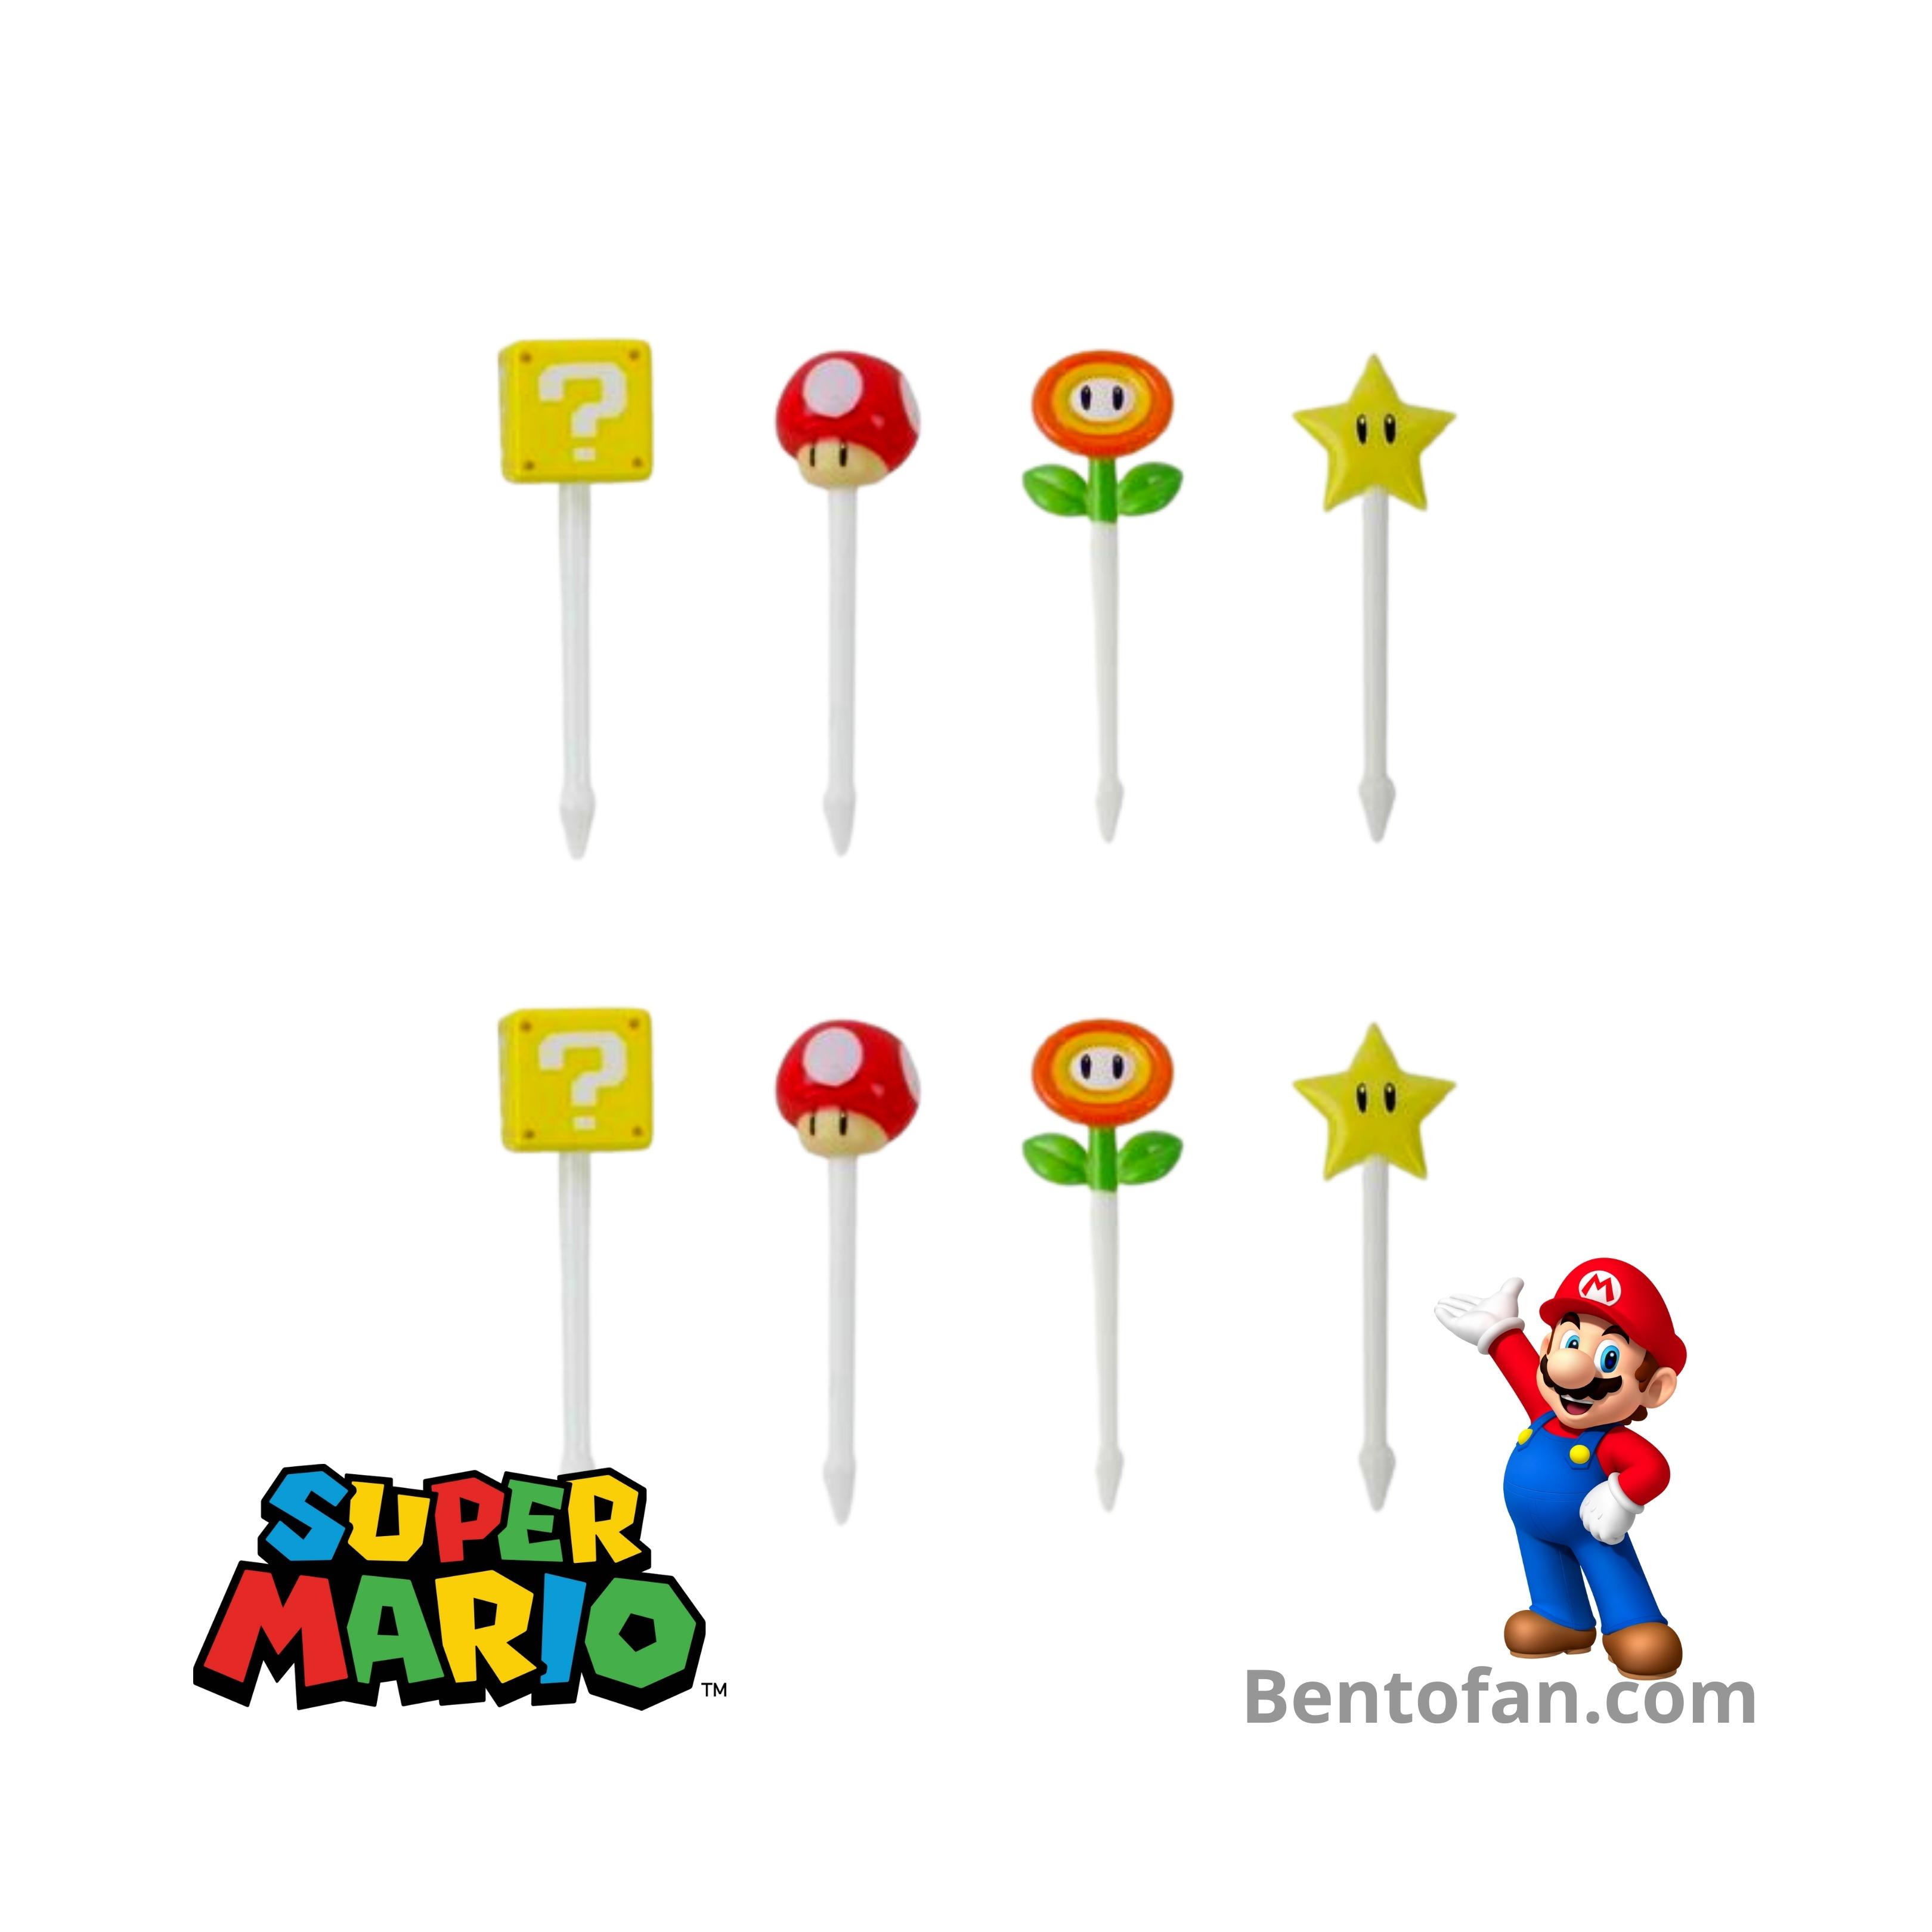 Super Mario bento prikkers